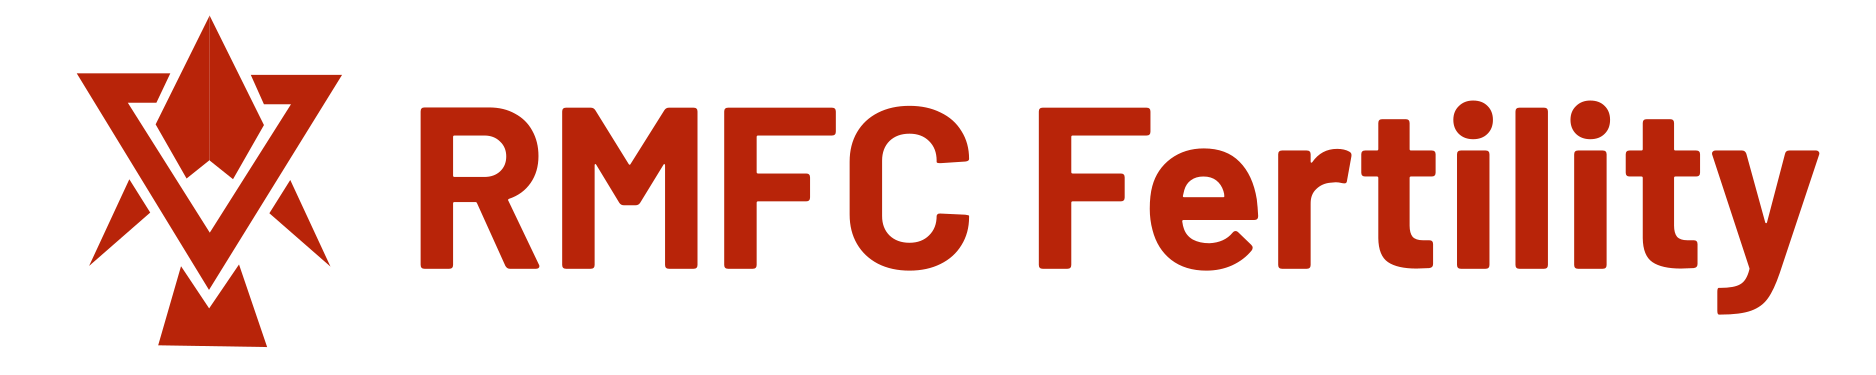 RMFC Fertility